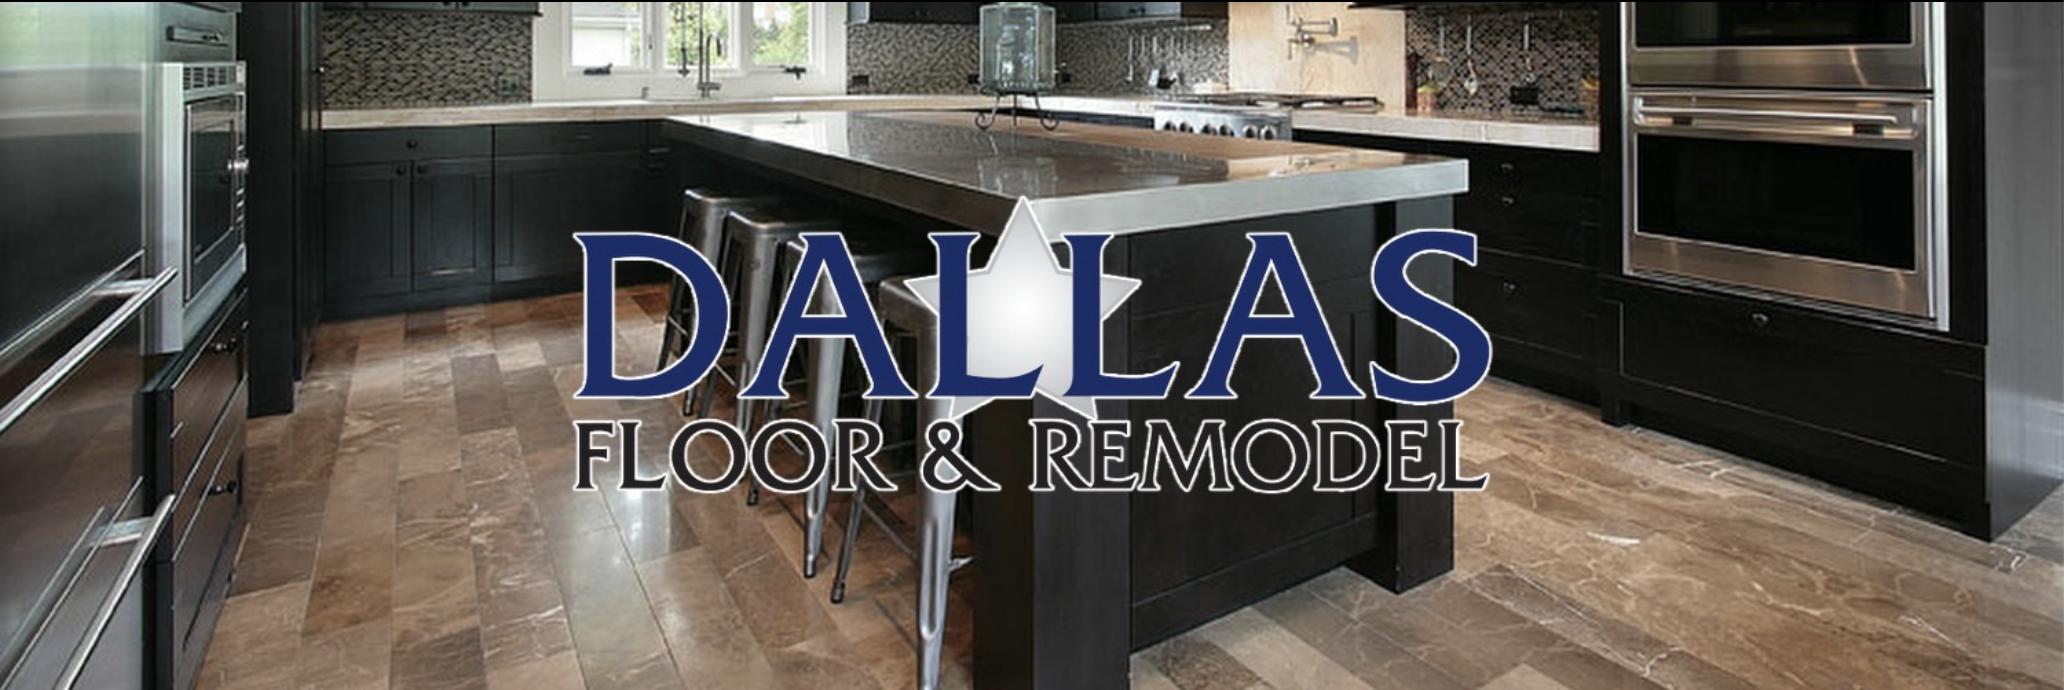 Dallas Floor and Remodel - 5057 Keller Springs Rd, Addison, TX 75001